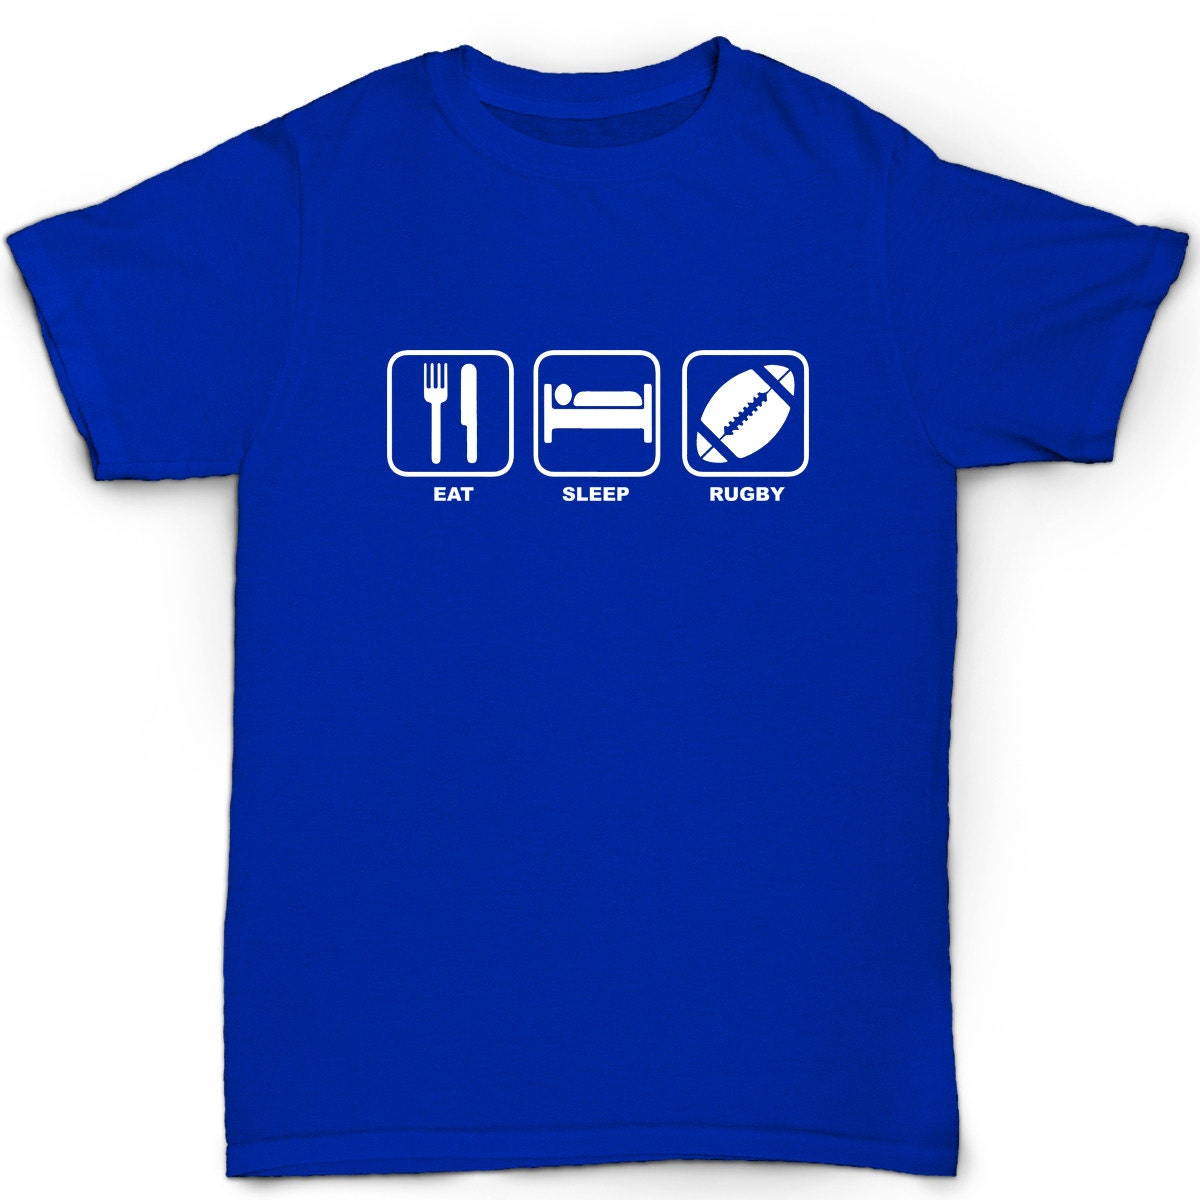 Eat Sleep Rugby Kids T Shirt Funny Humour Birthday Boys